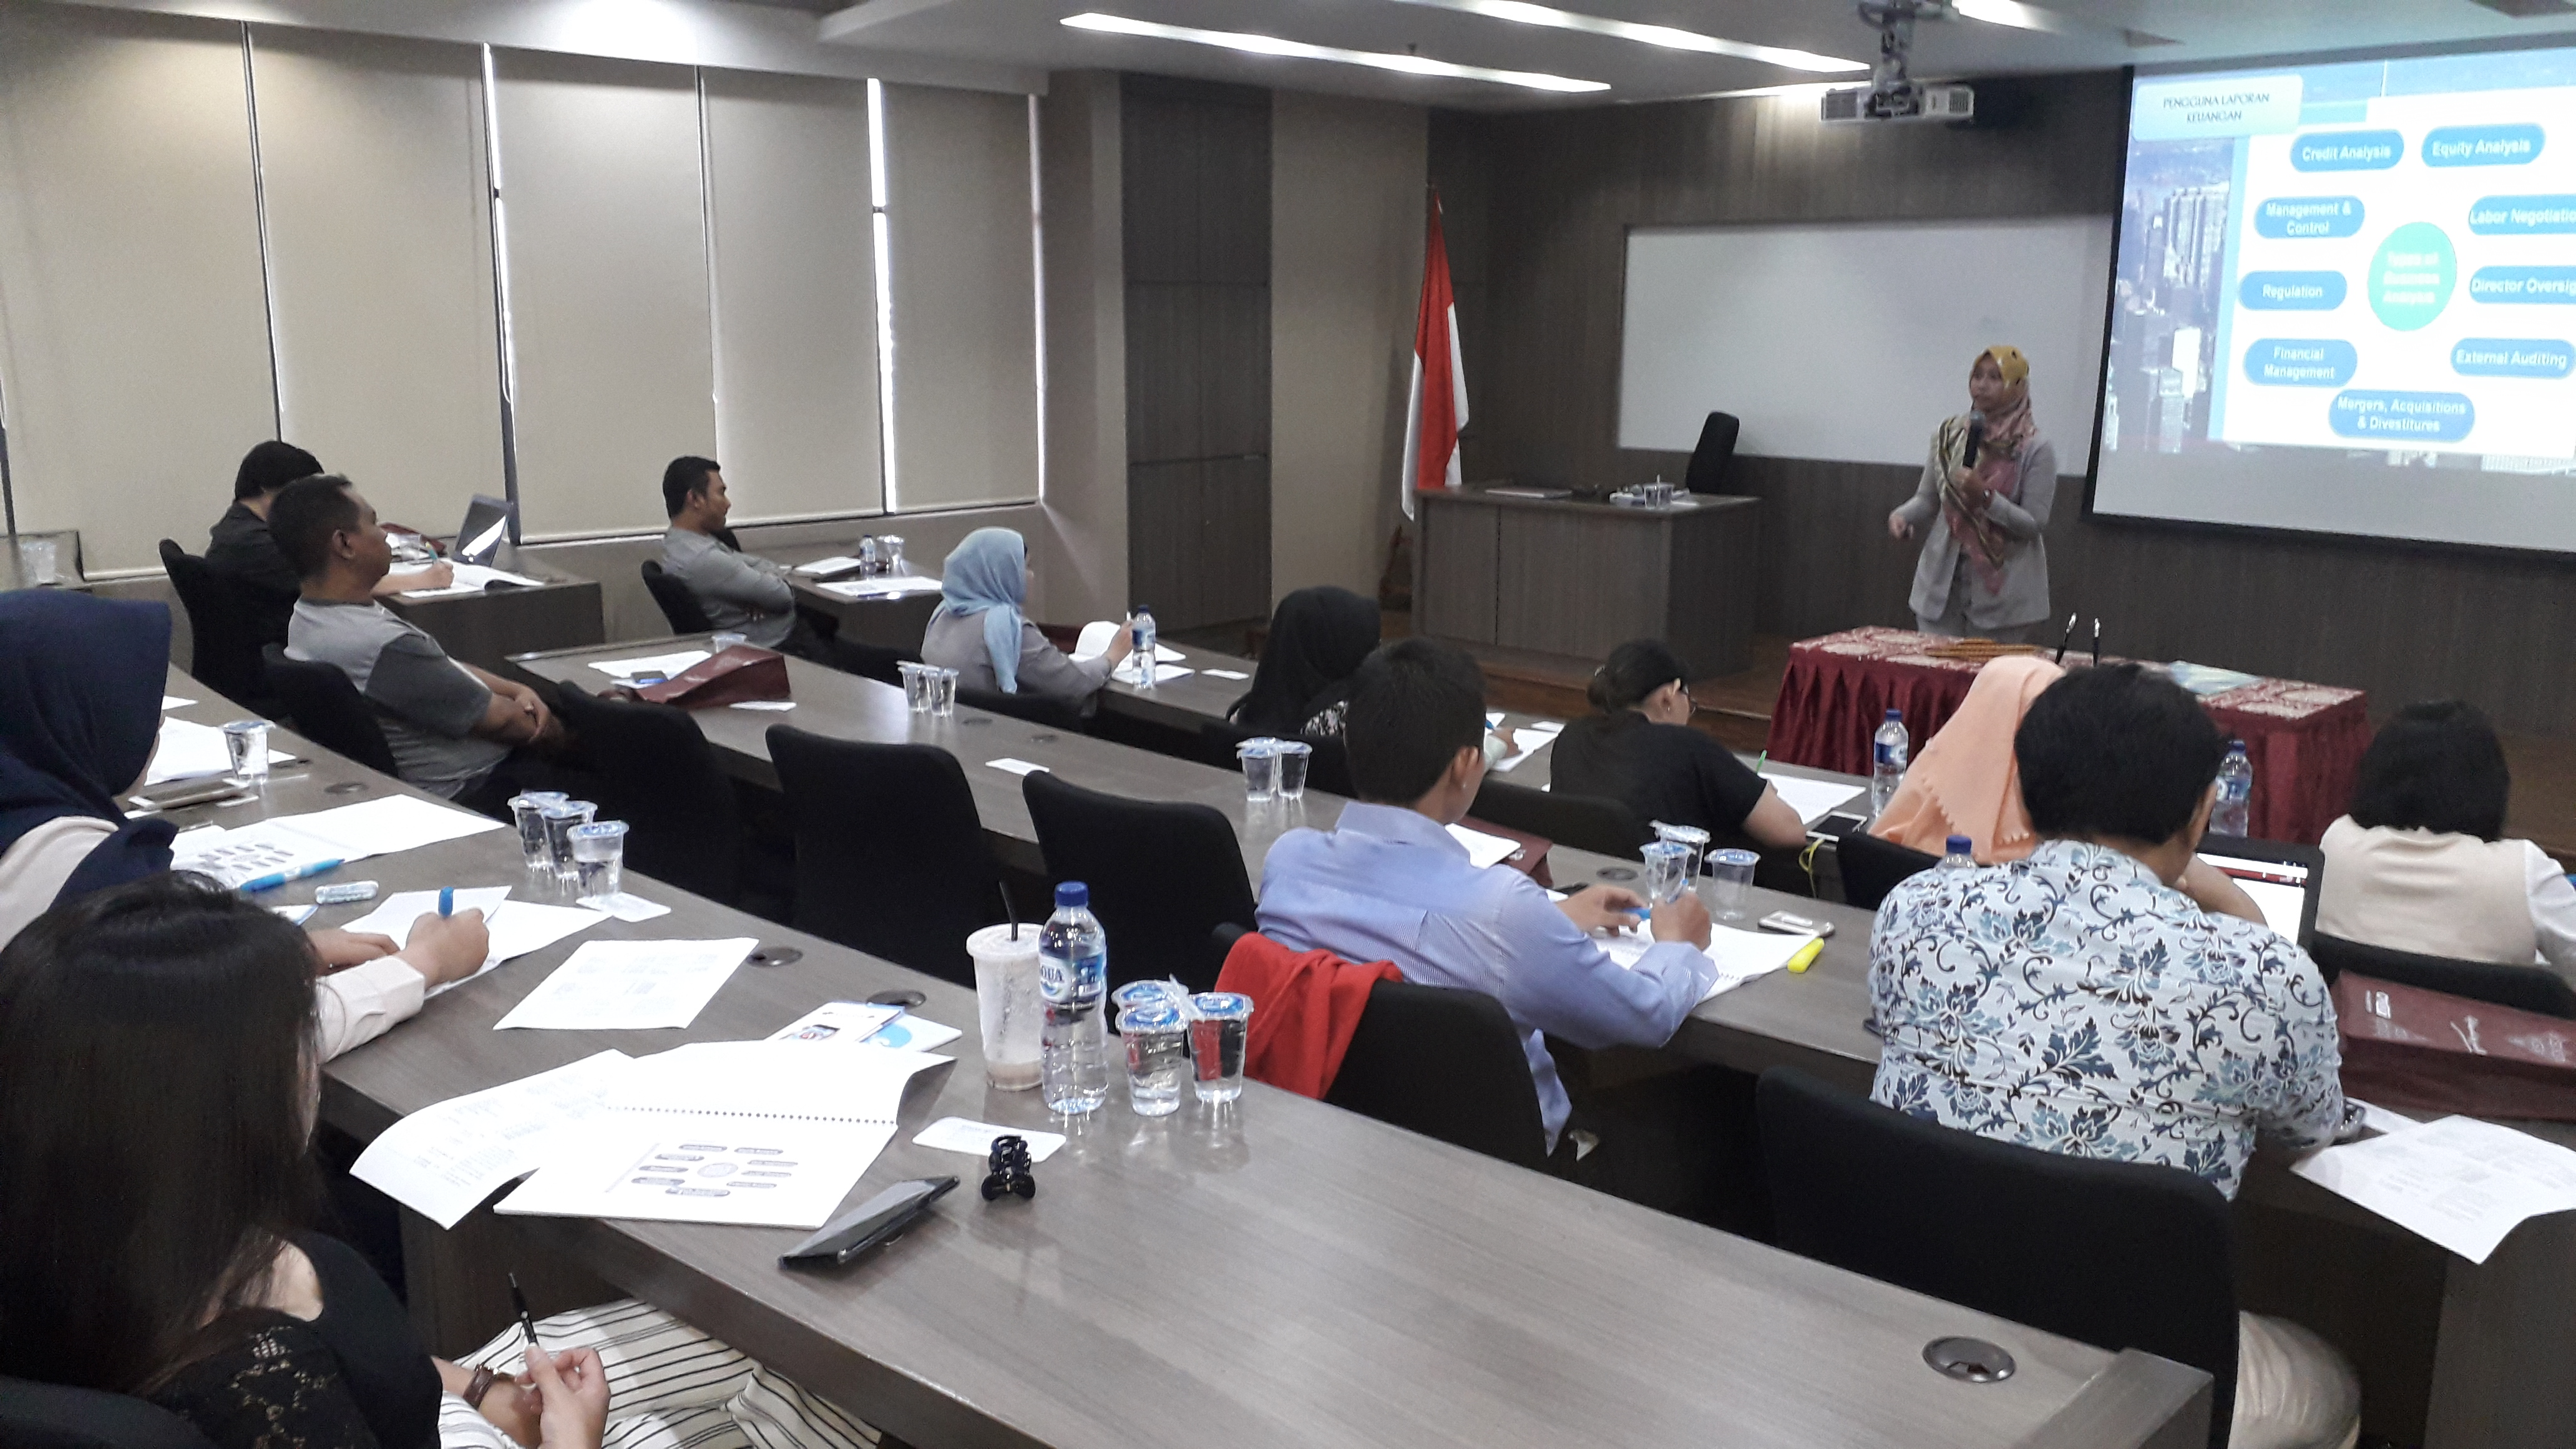 Program Pengabdian Masyarakat, Trisakti School of Management Gandeng PT UTS Bantu UKM